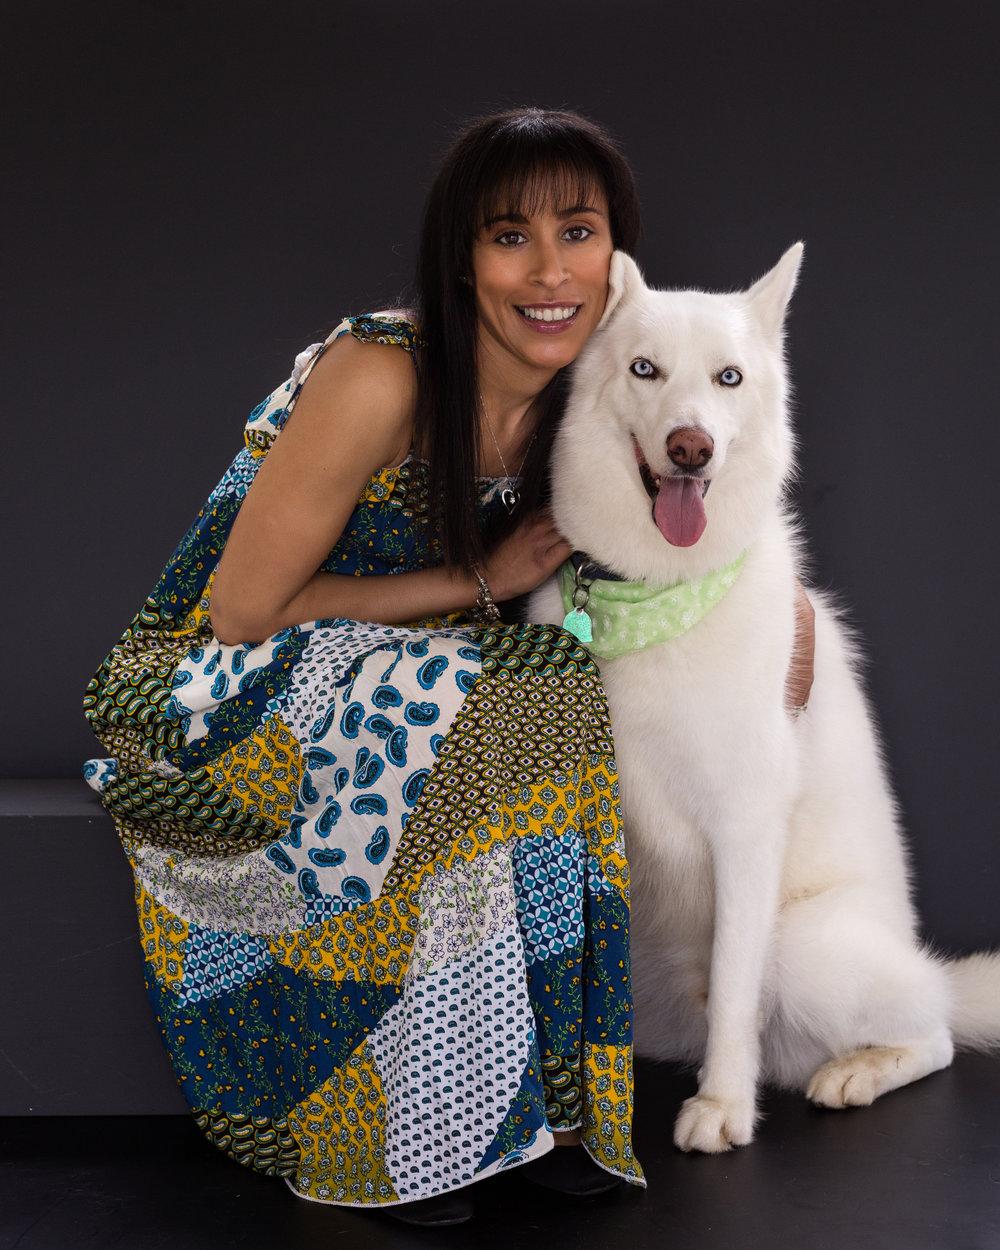 Studio family photo-dog photo-husky dog